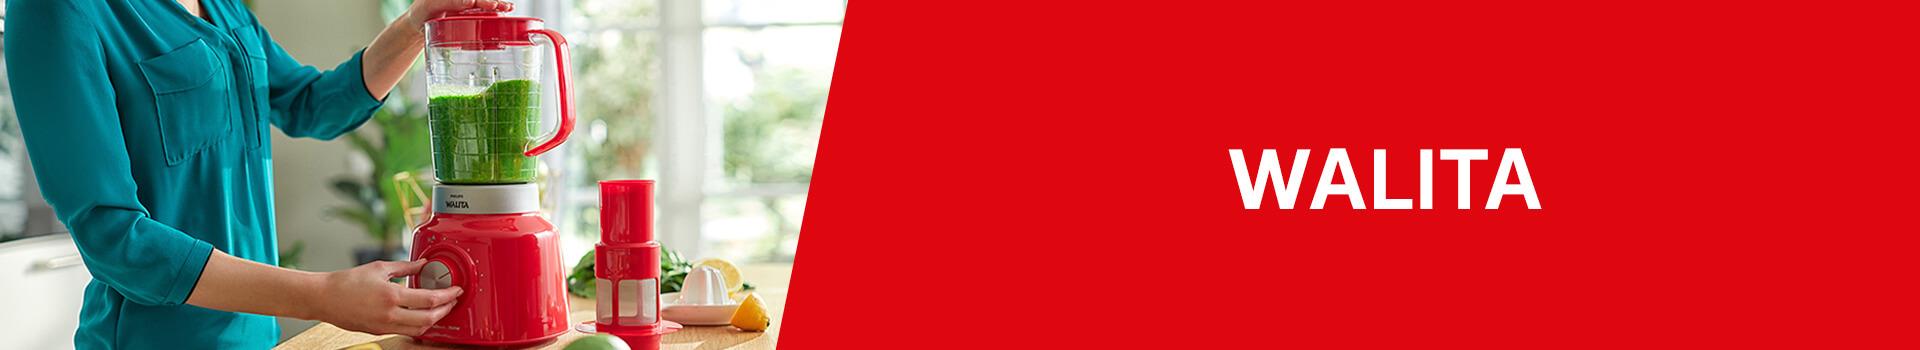 Banner Walita